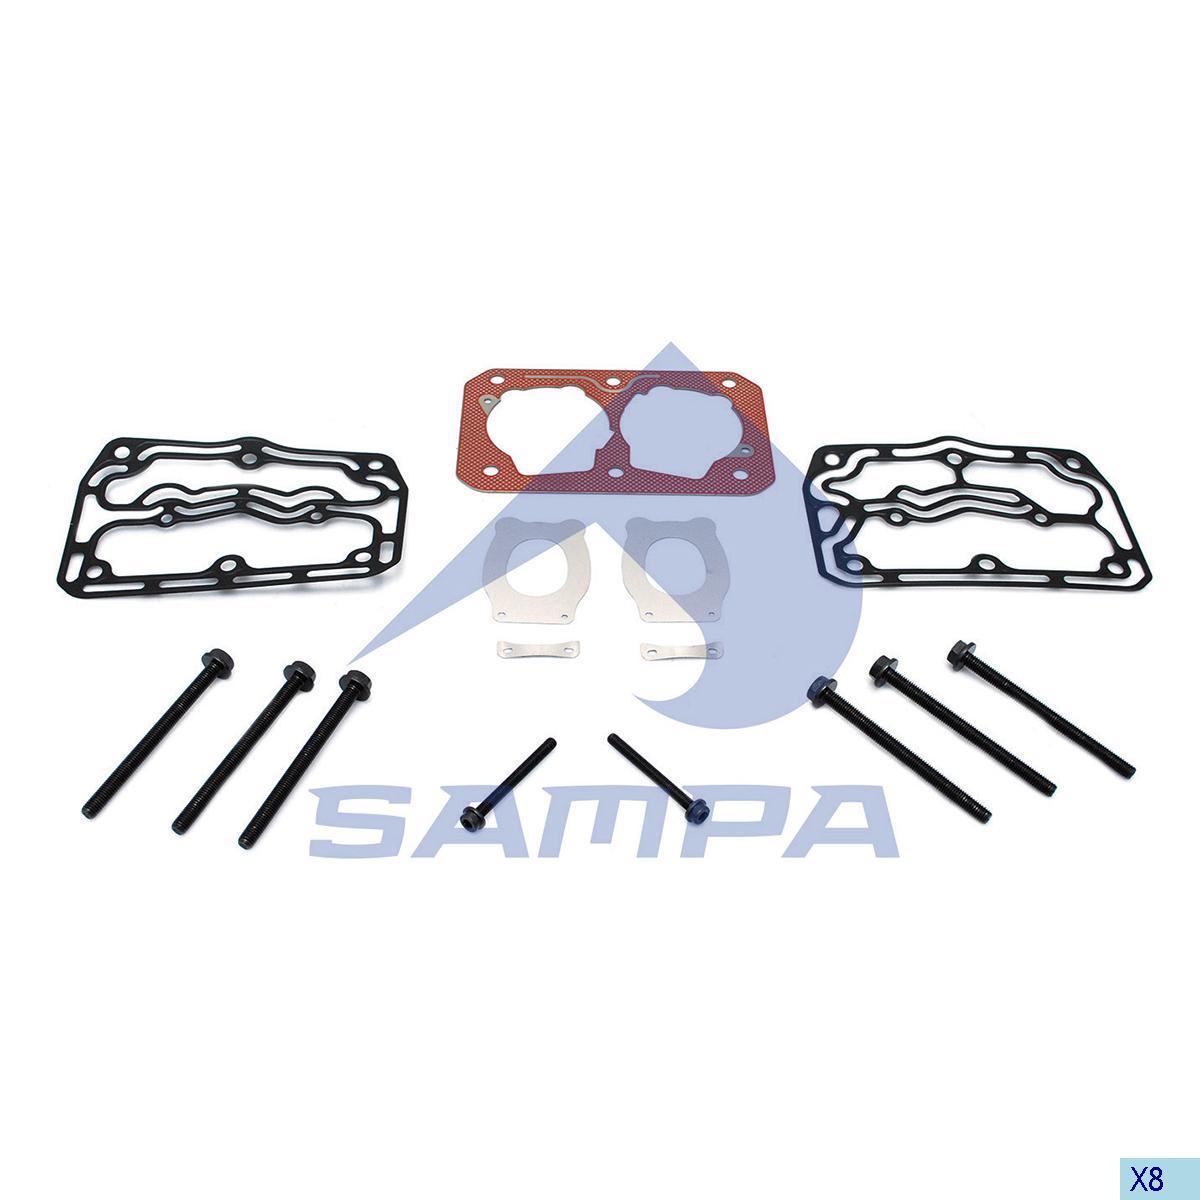 Repair Kit, Cylinder Head, Daf, Compressed Air System